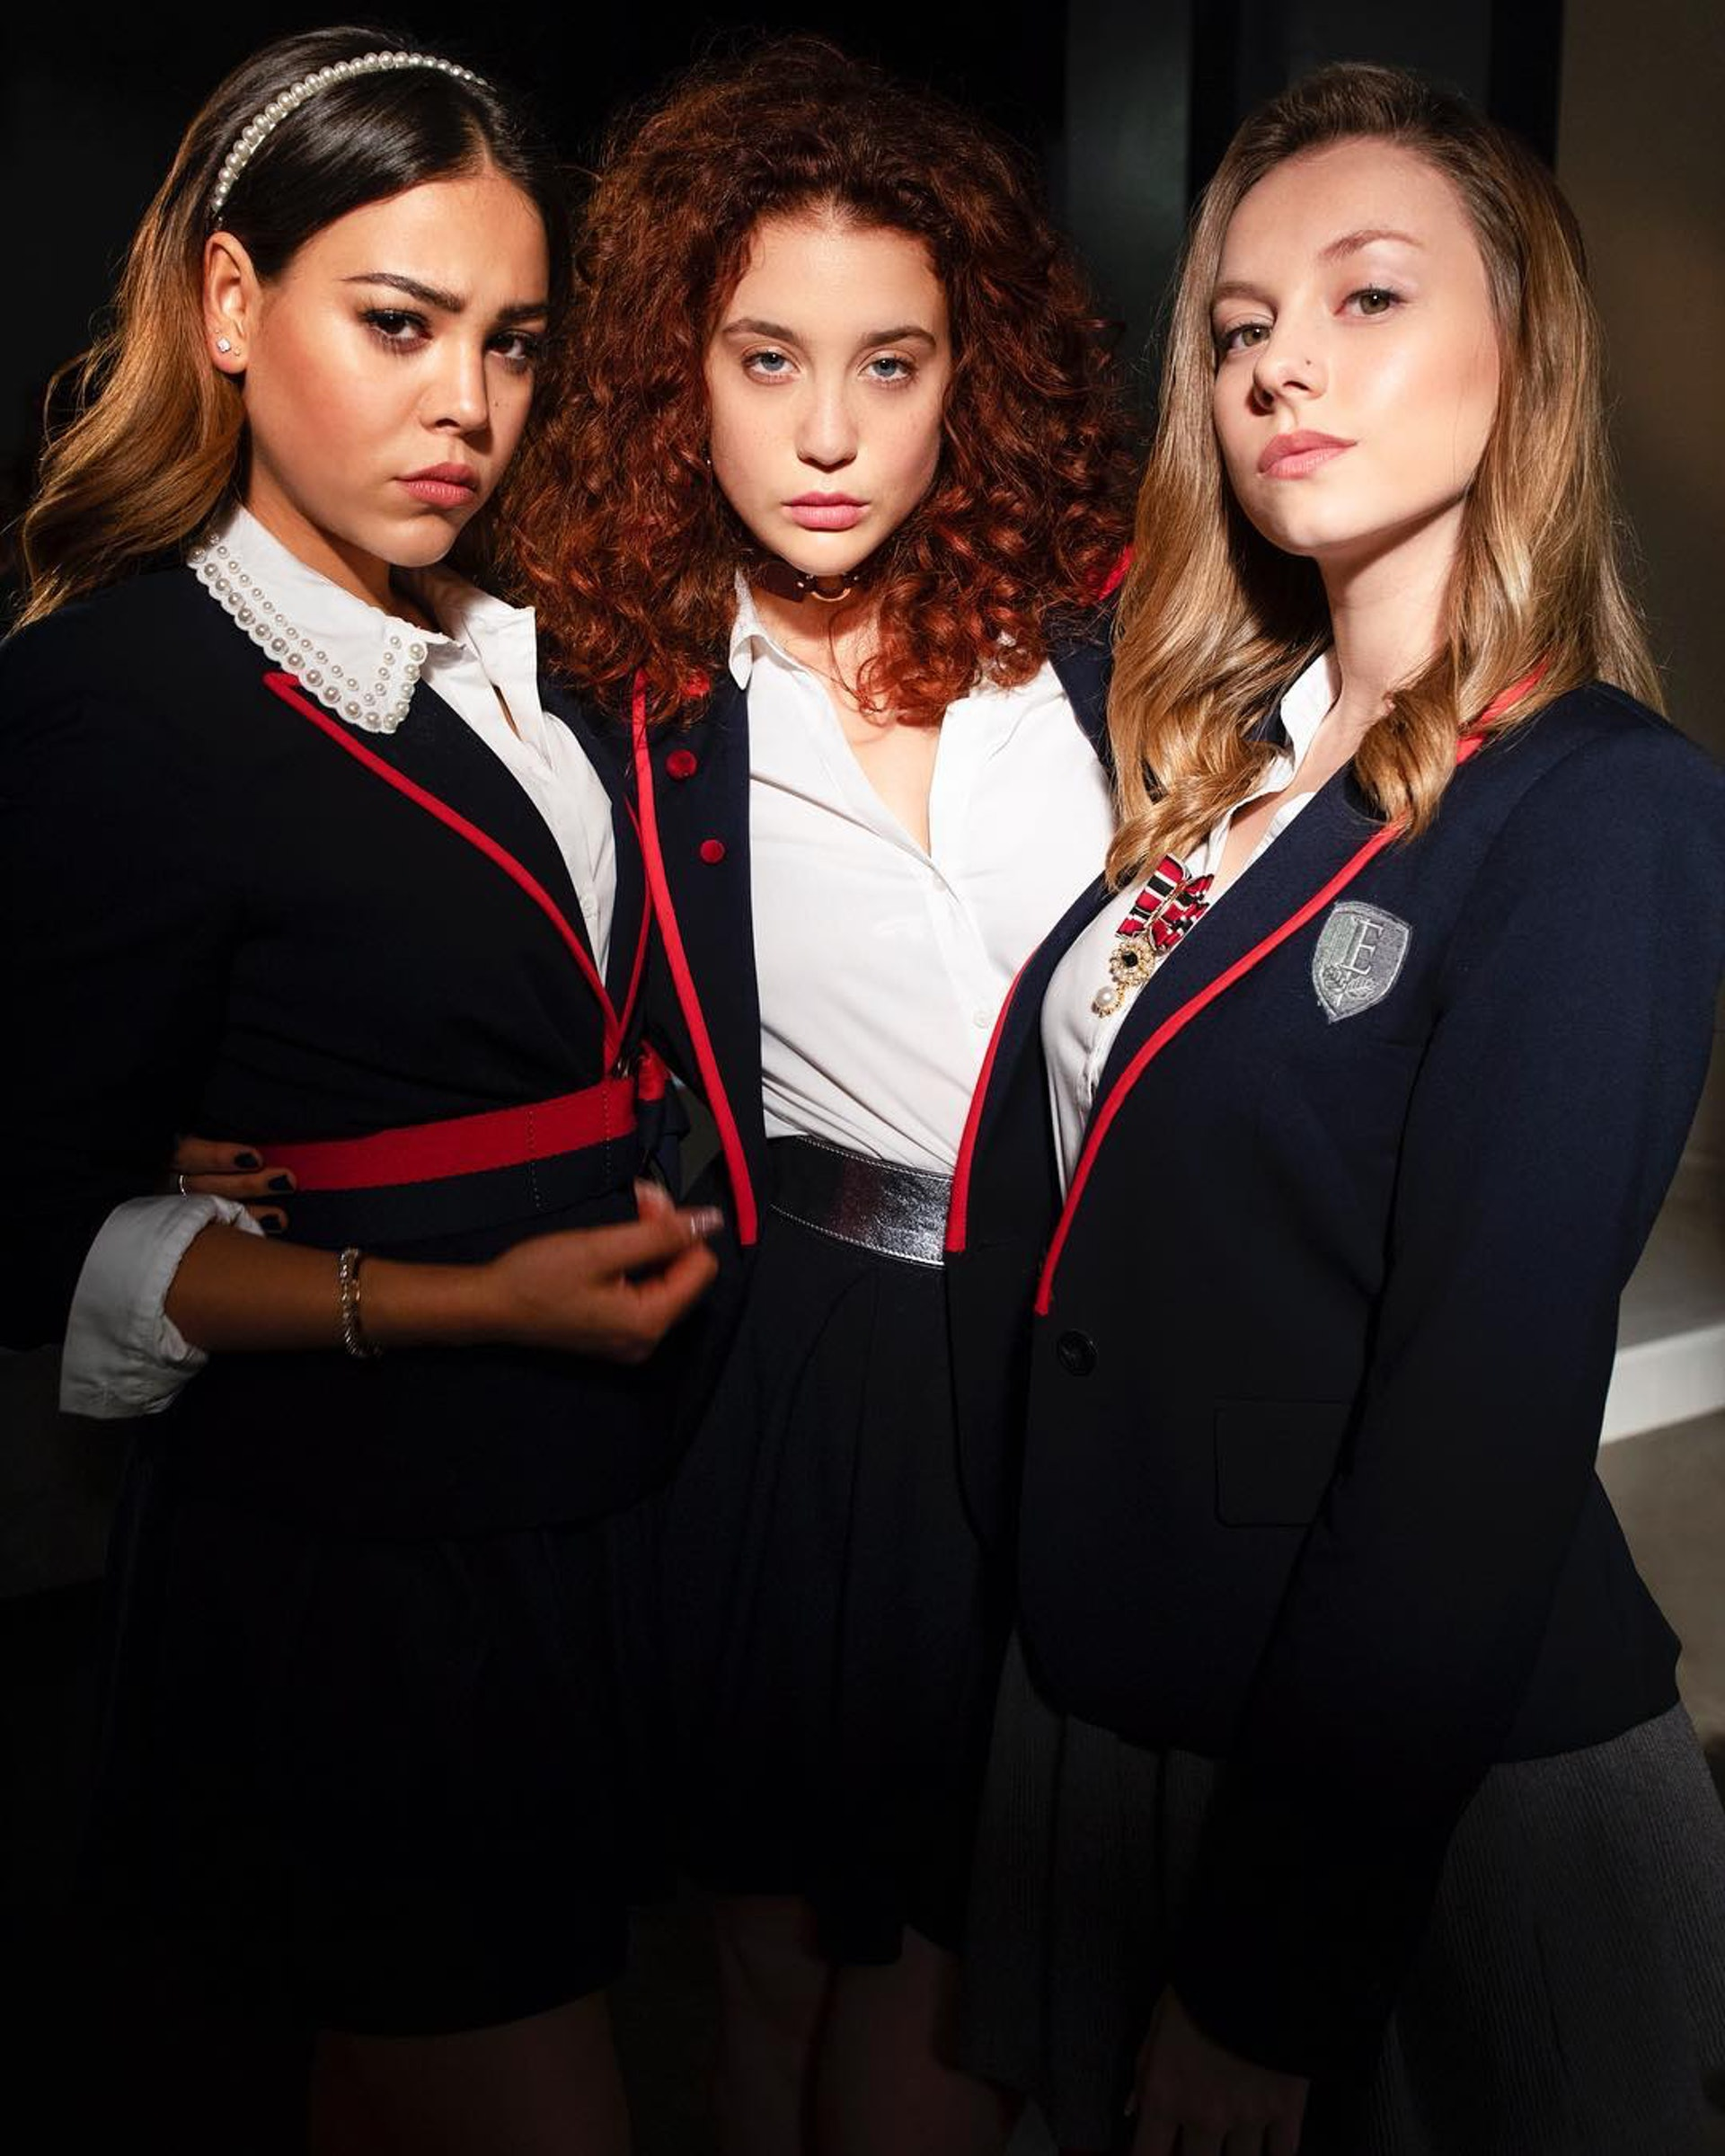 Ester在Netflix西班牙原創校園劇《名校風暴》(Elite)中飾演Carla。(IG@ester_exposito)